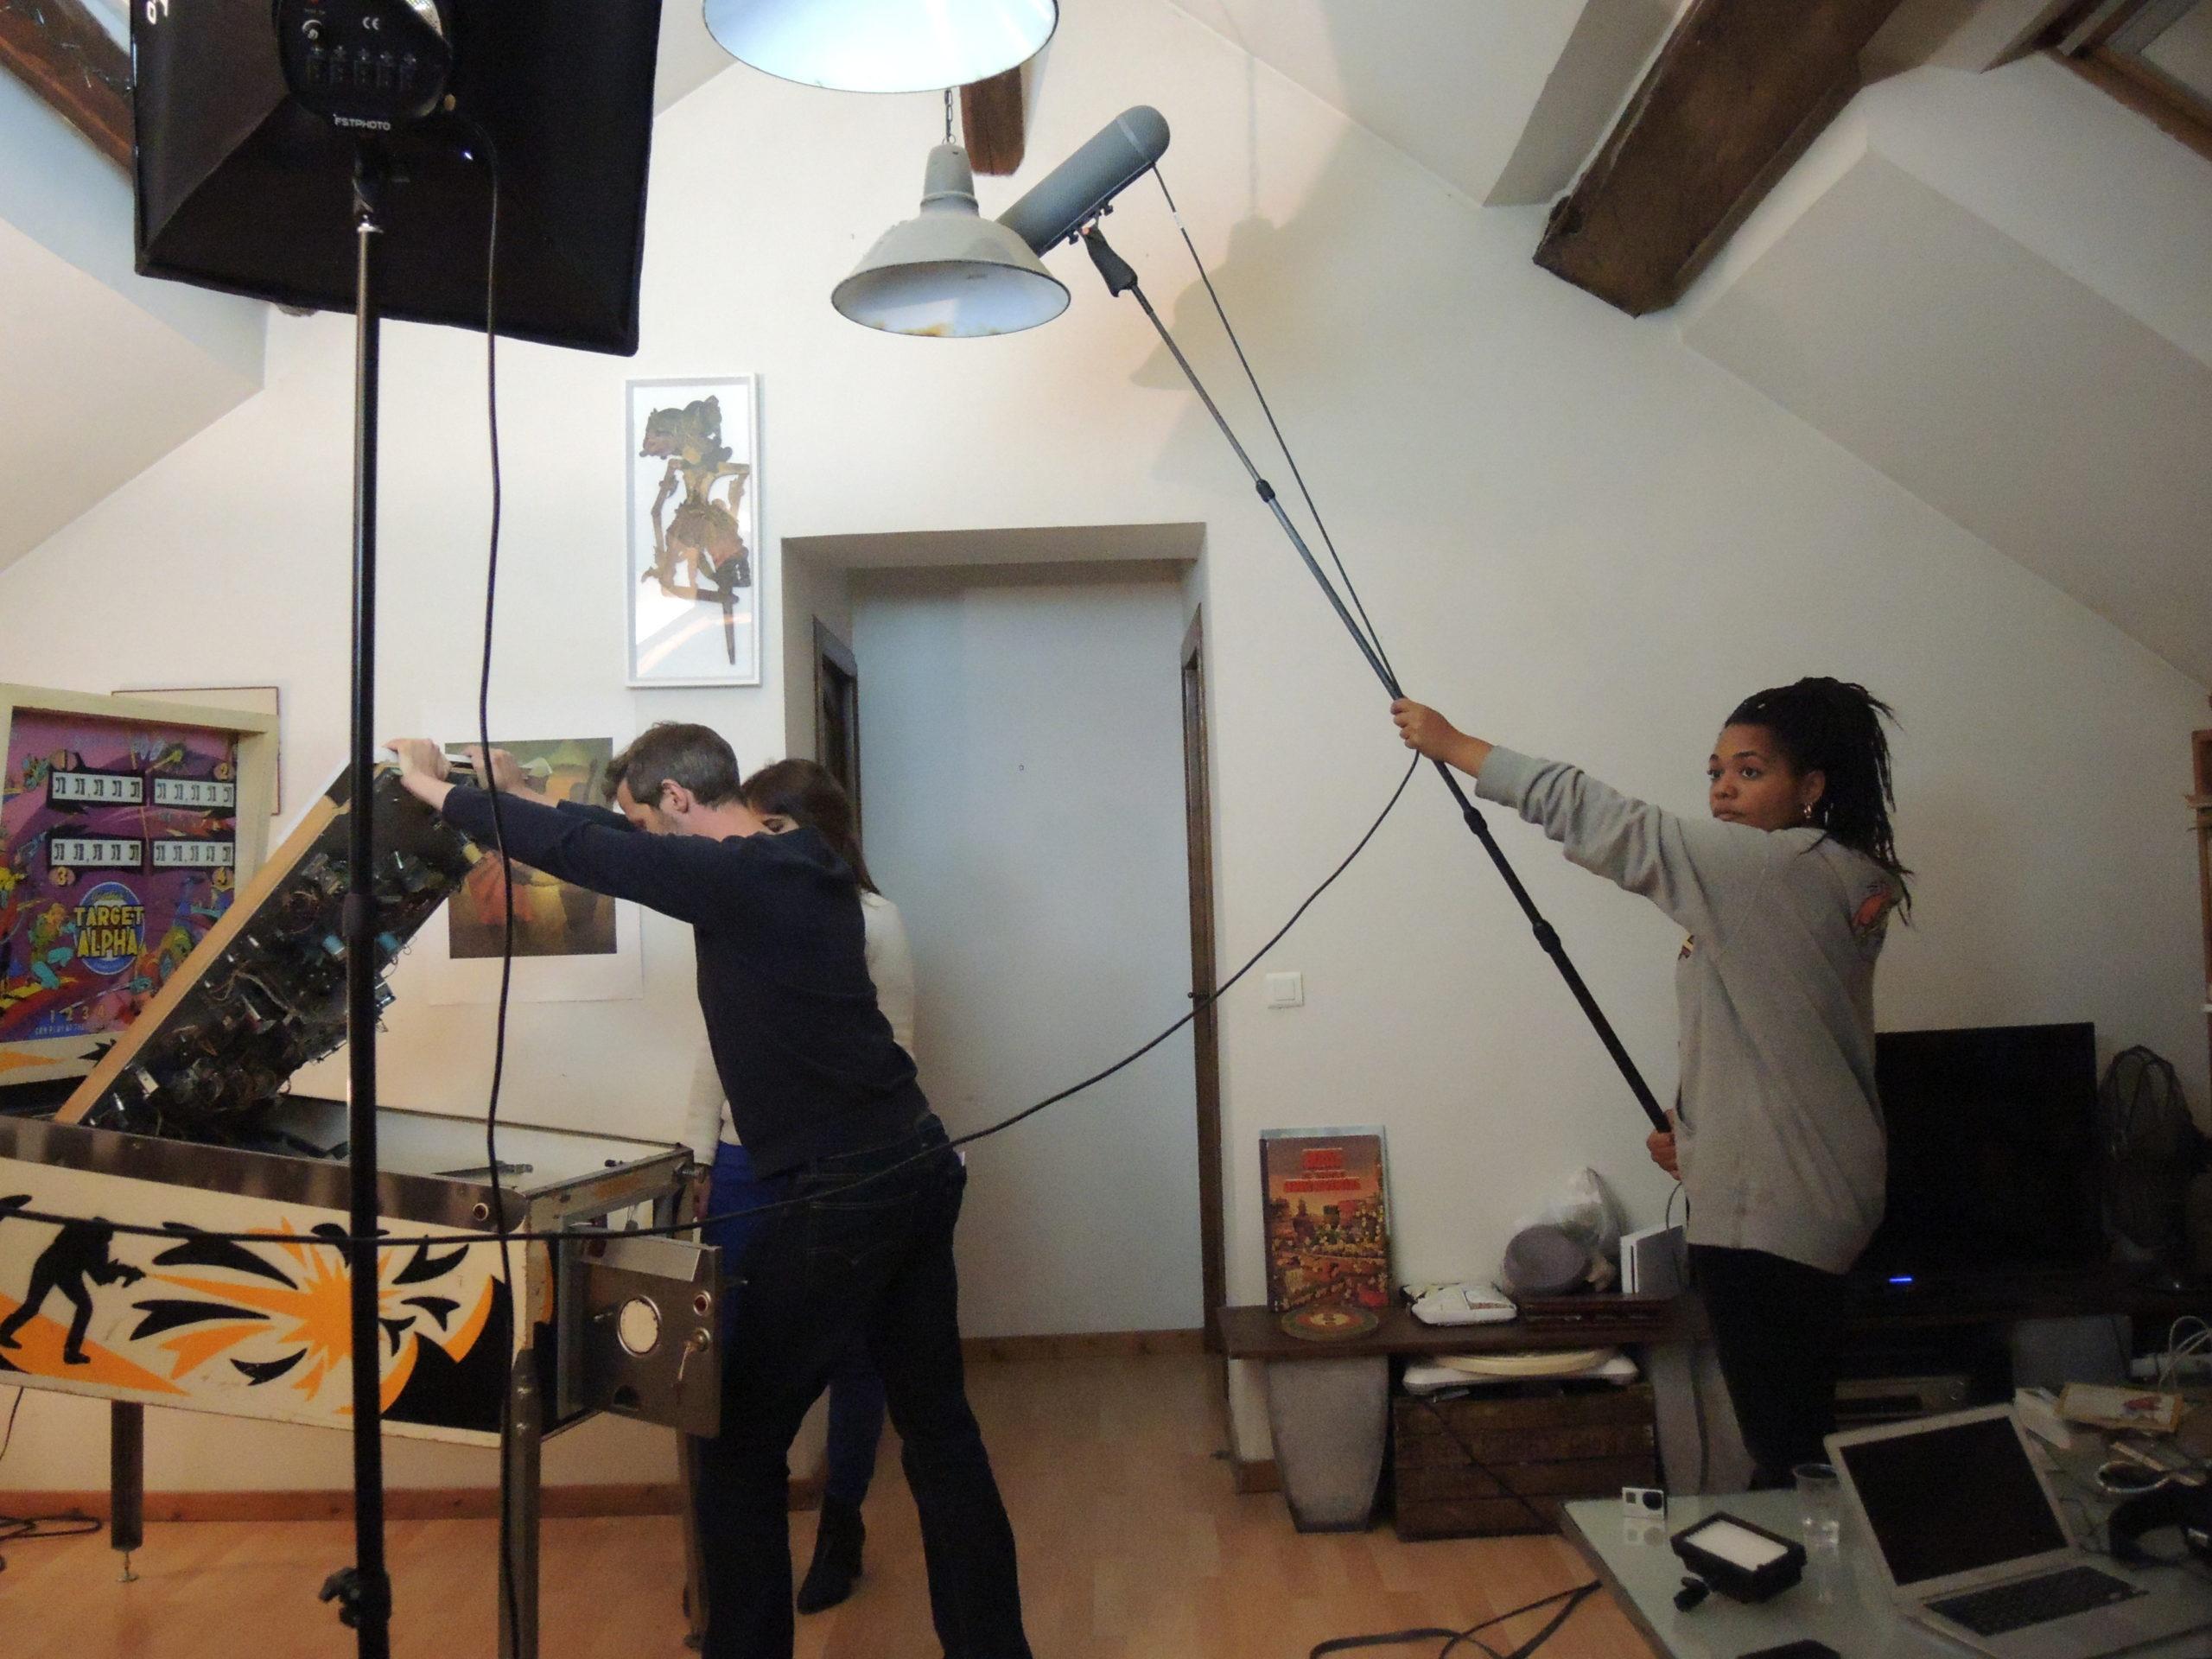 Game over photos tournage 44